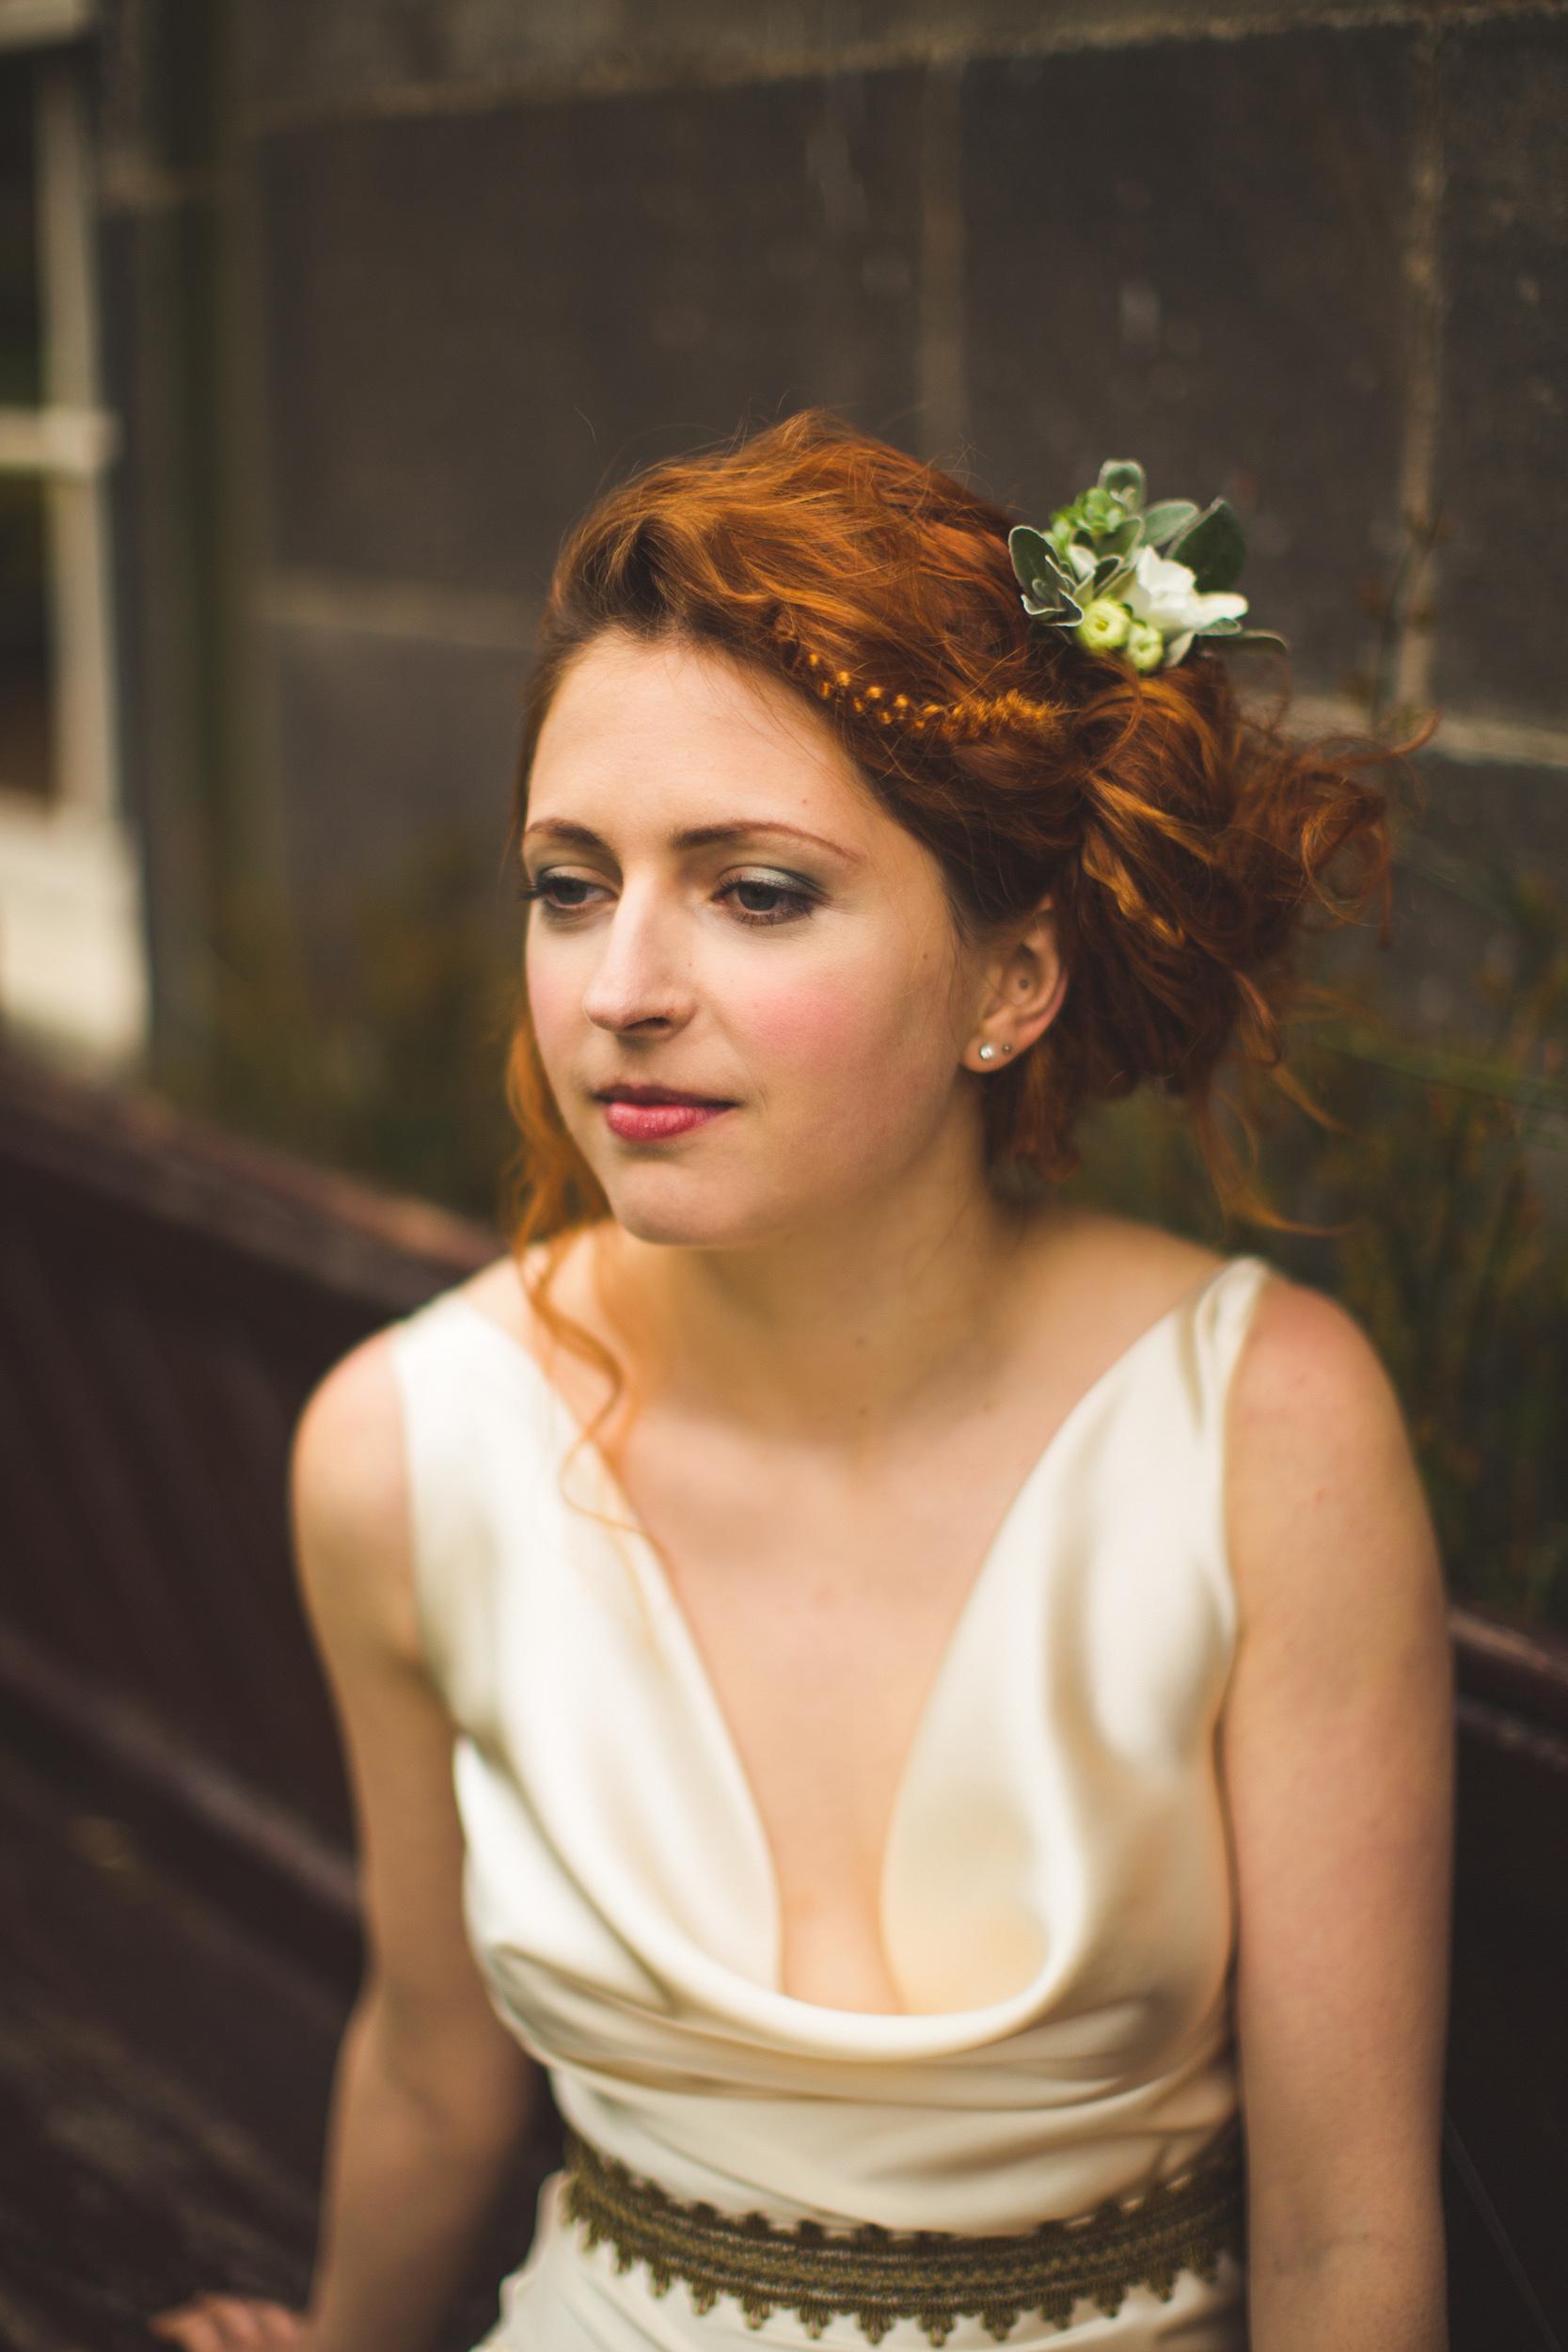 kate-beaumont-vintage-inspired-bridal-wedding-dresses-Sheffield-S6-12.jpg